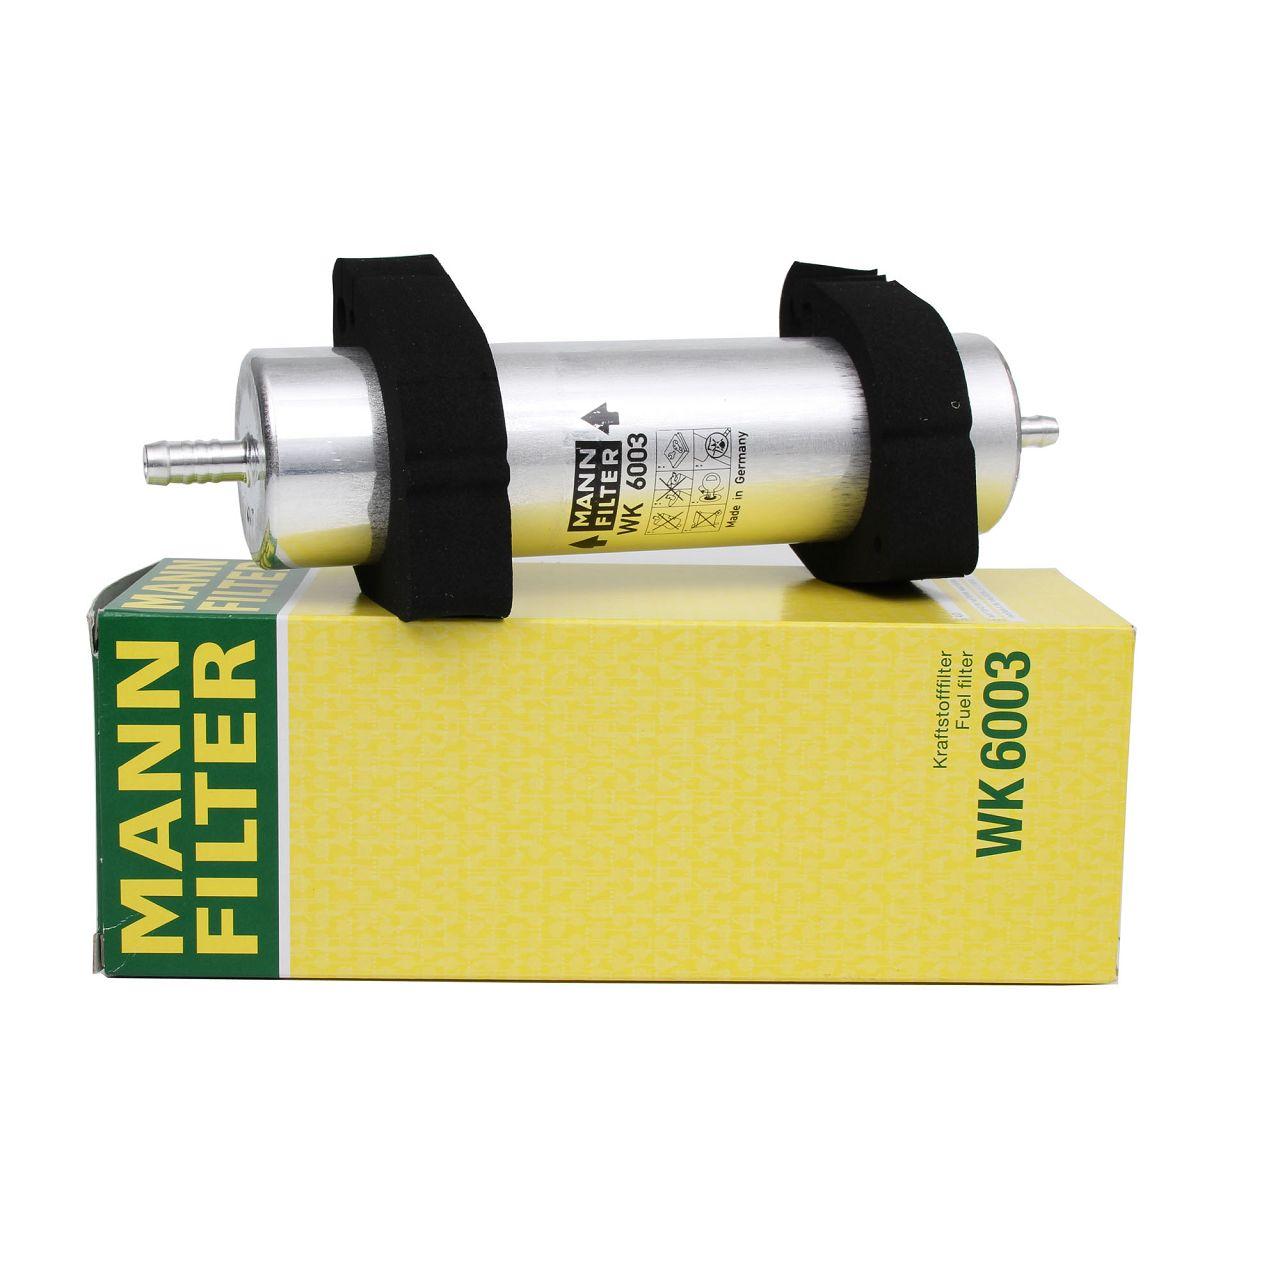 MANN Kraftstofffilter Dieselfilter WK6003 für Audi A4 A5 A6 A8 Q5 Q7 2.0-4.2 TDI